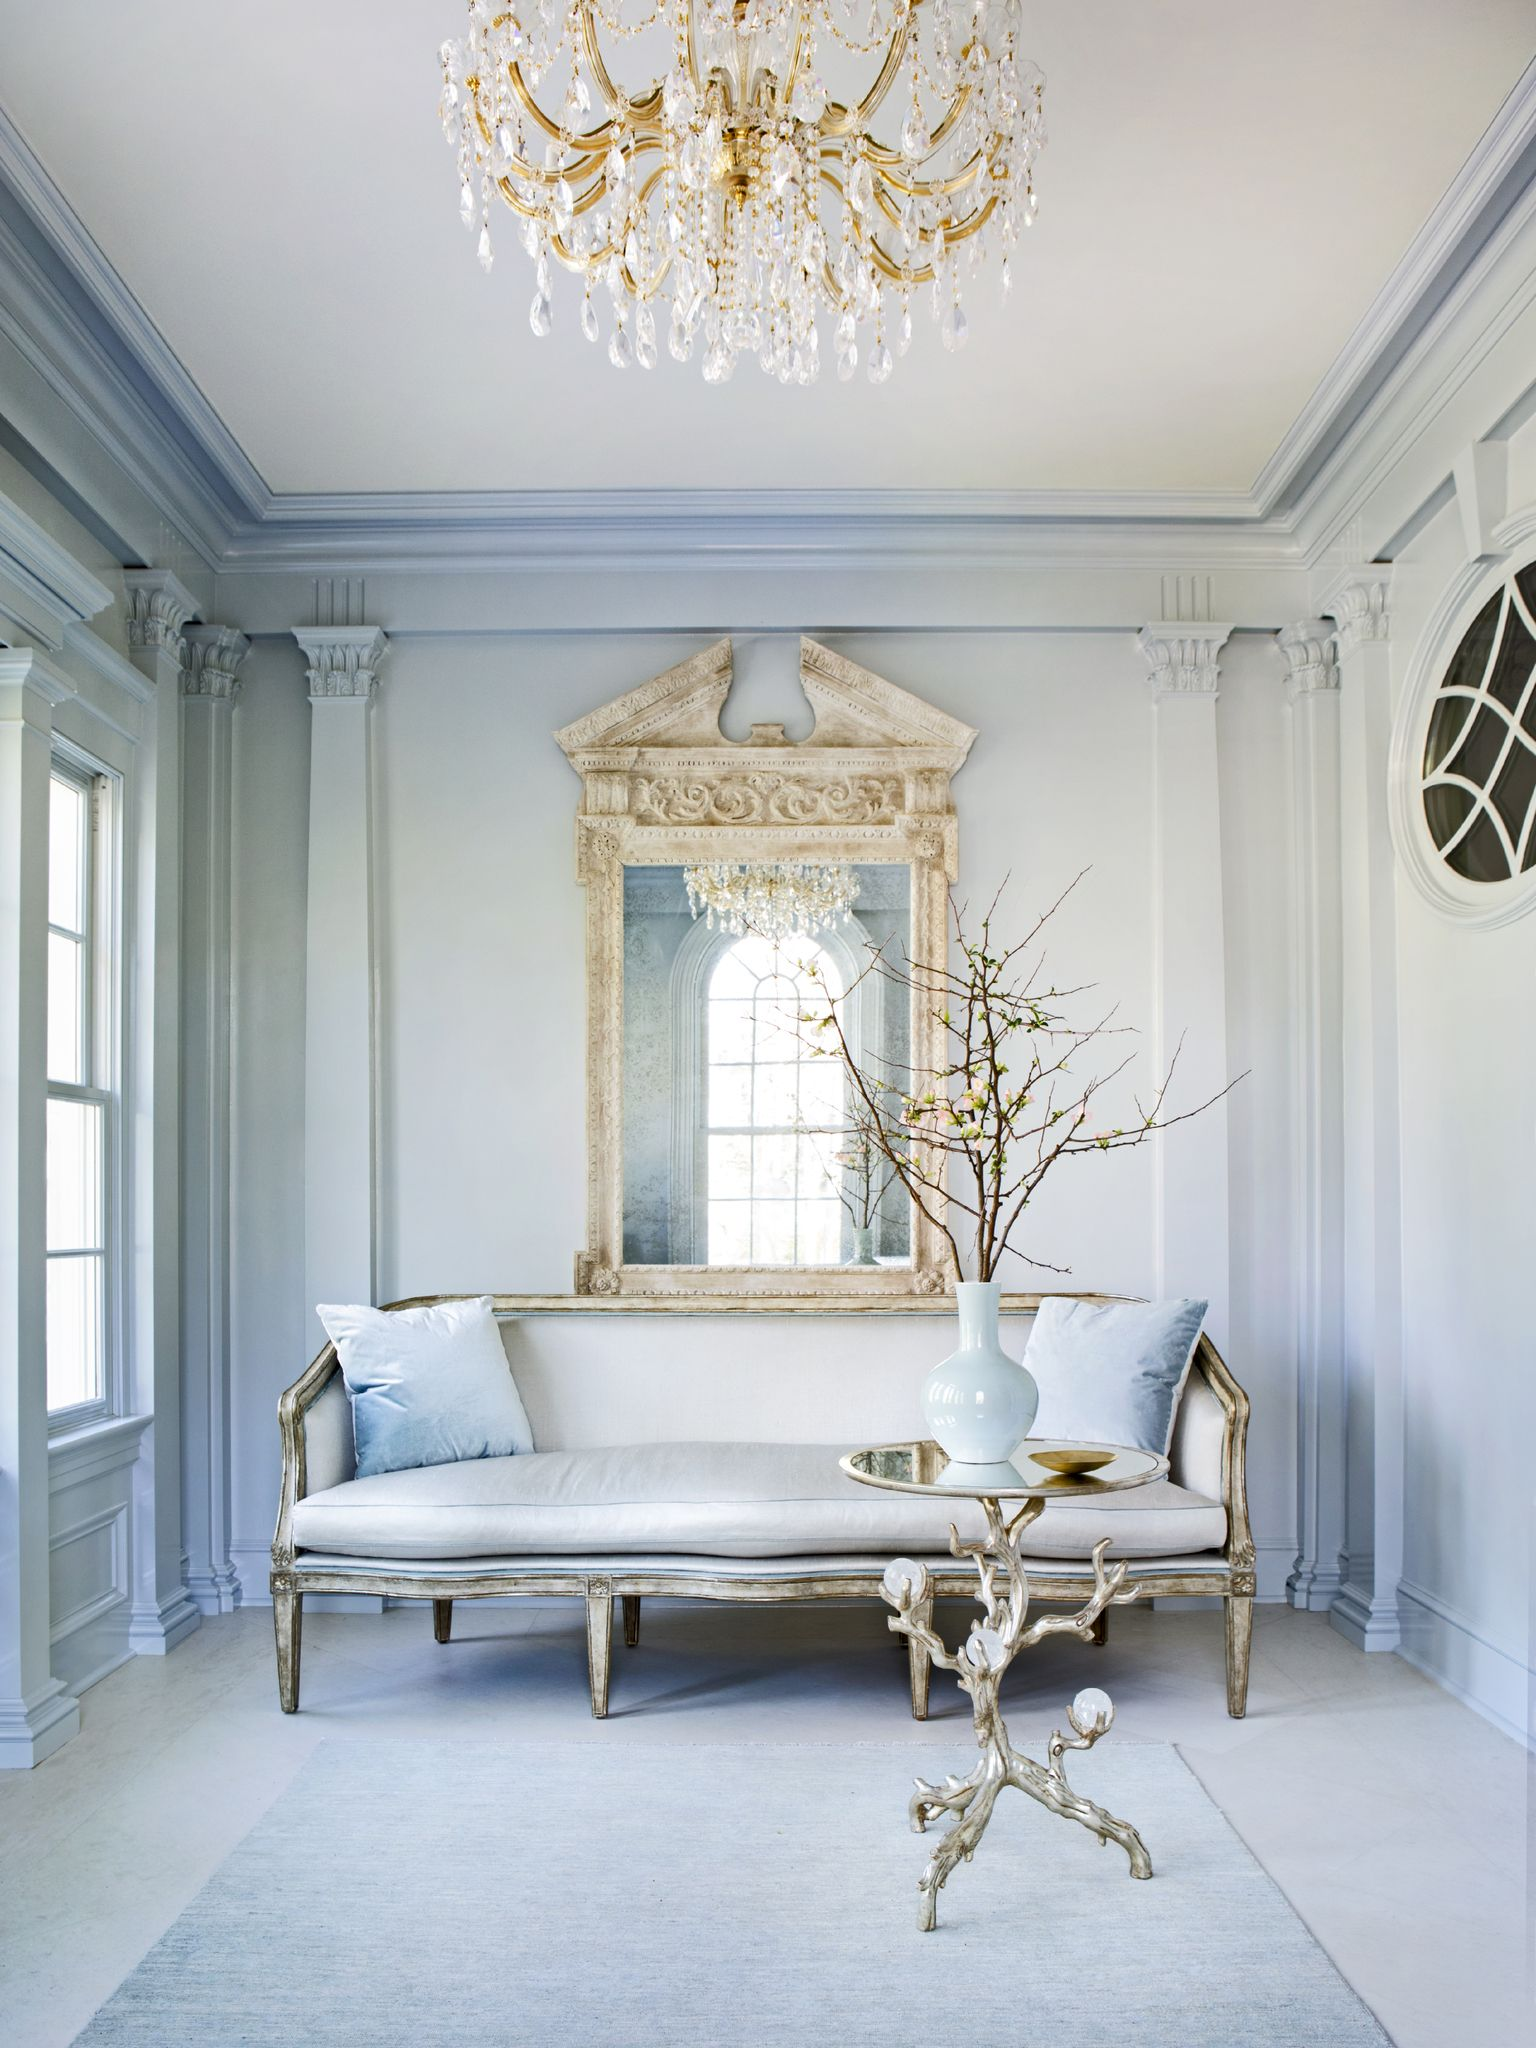 Interior Designer Suzanne Kasler Sophisticated Simplicity With